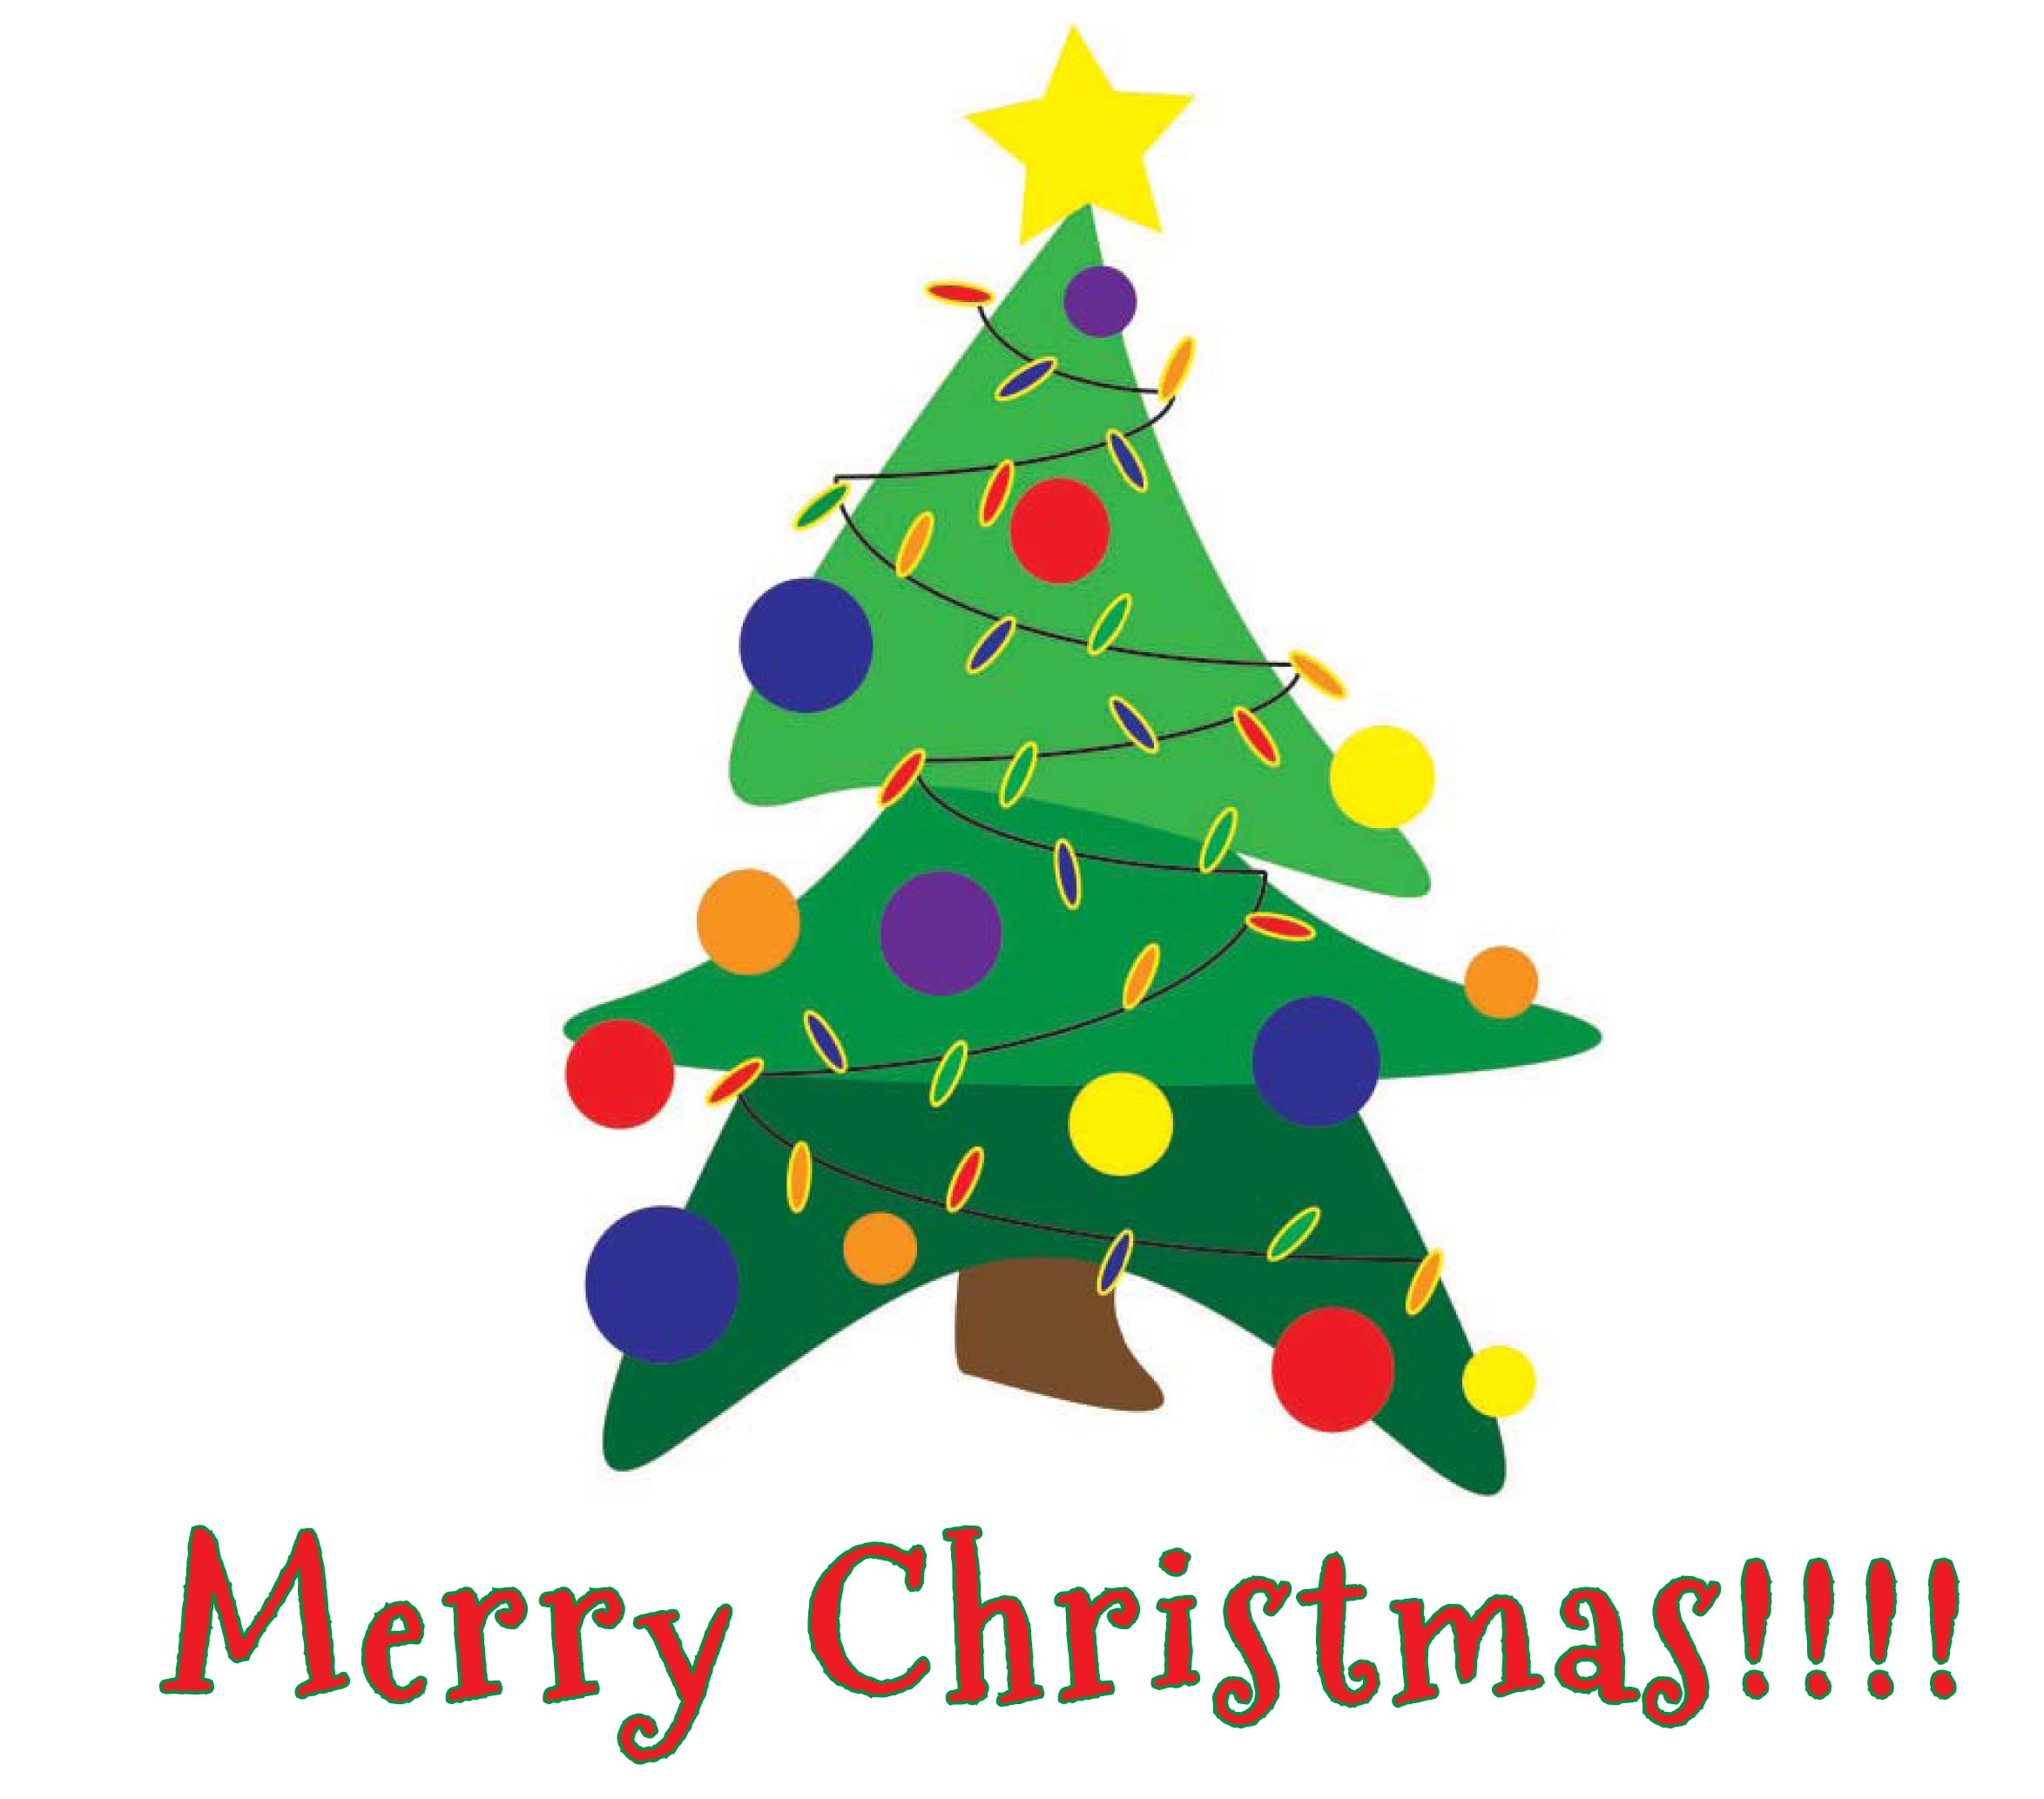 Merry Christmas Lit Tree.jpg